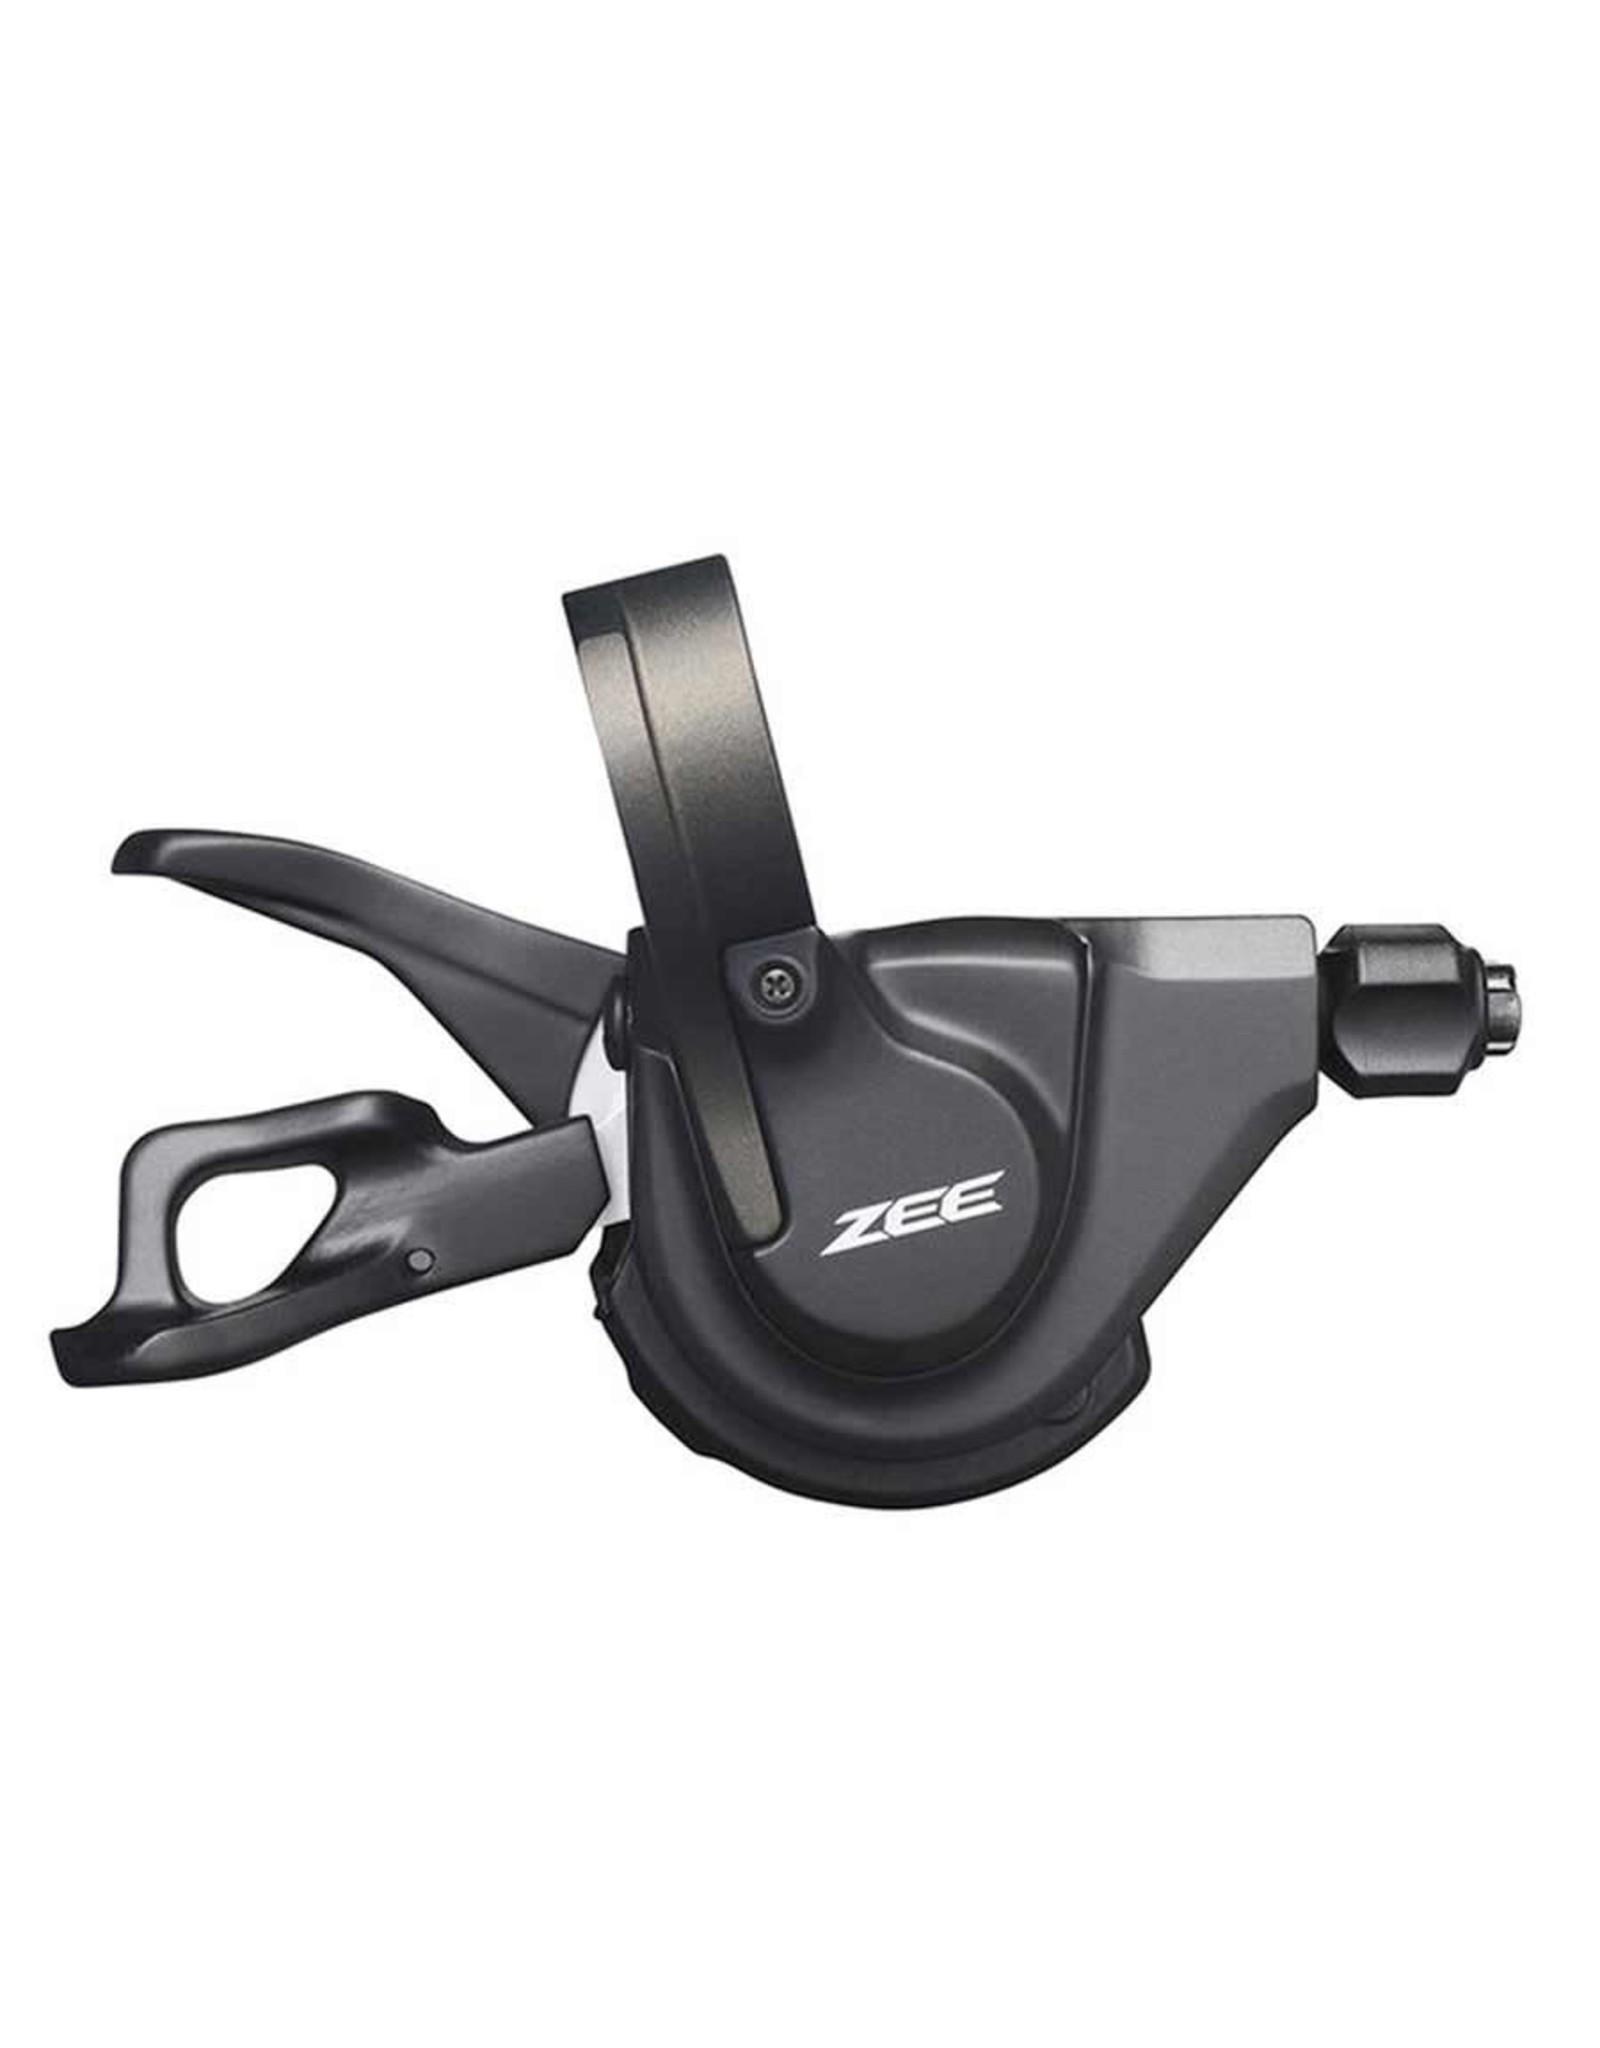 Shimano Shimano - ZEE SL-M640, Shift lever, 10sp, Rear